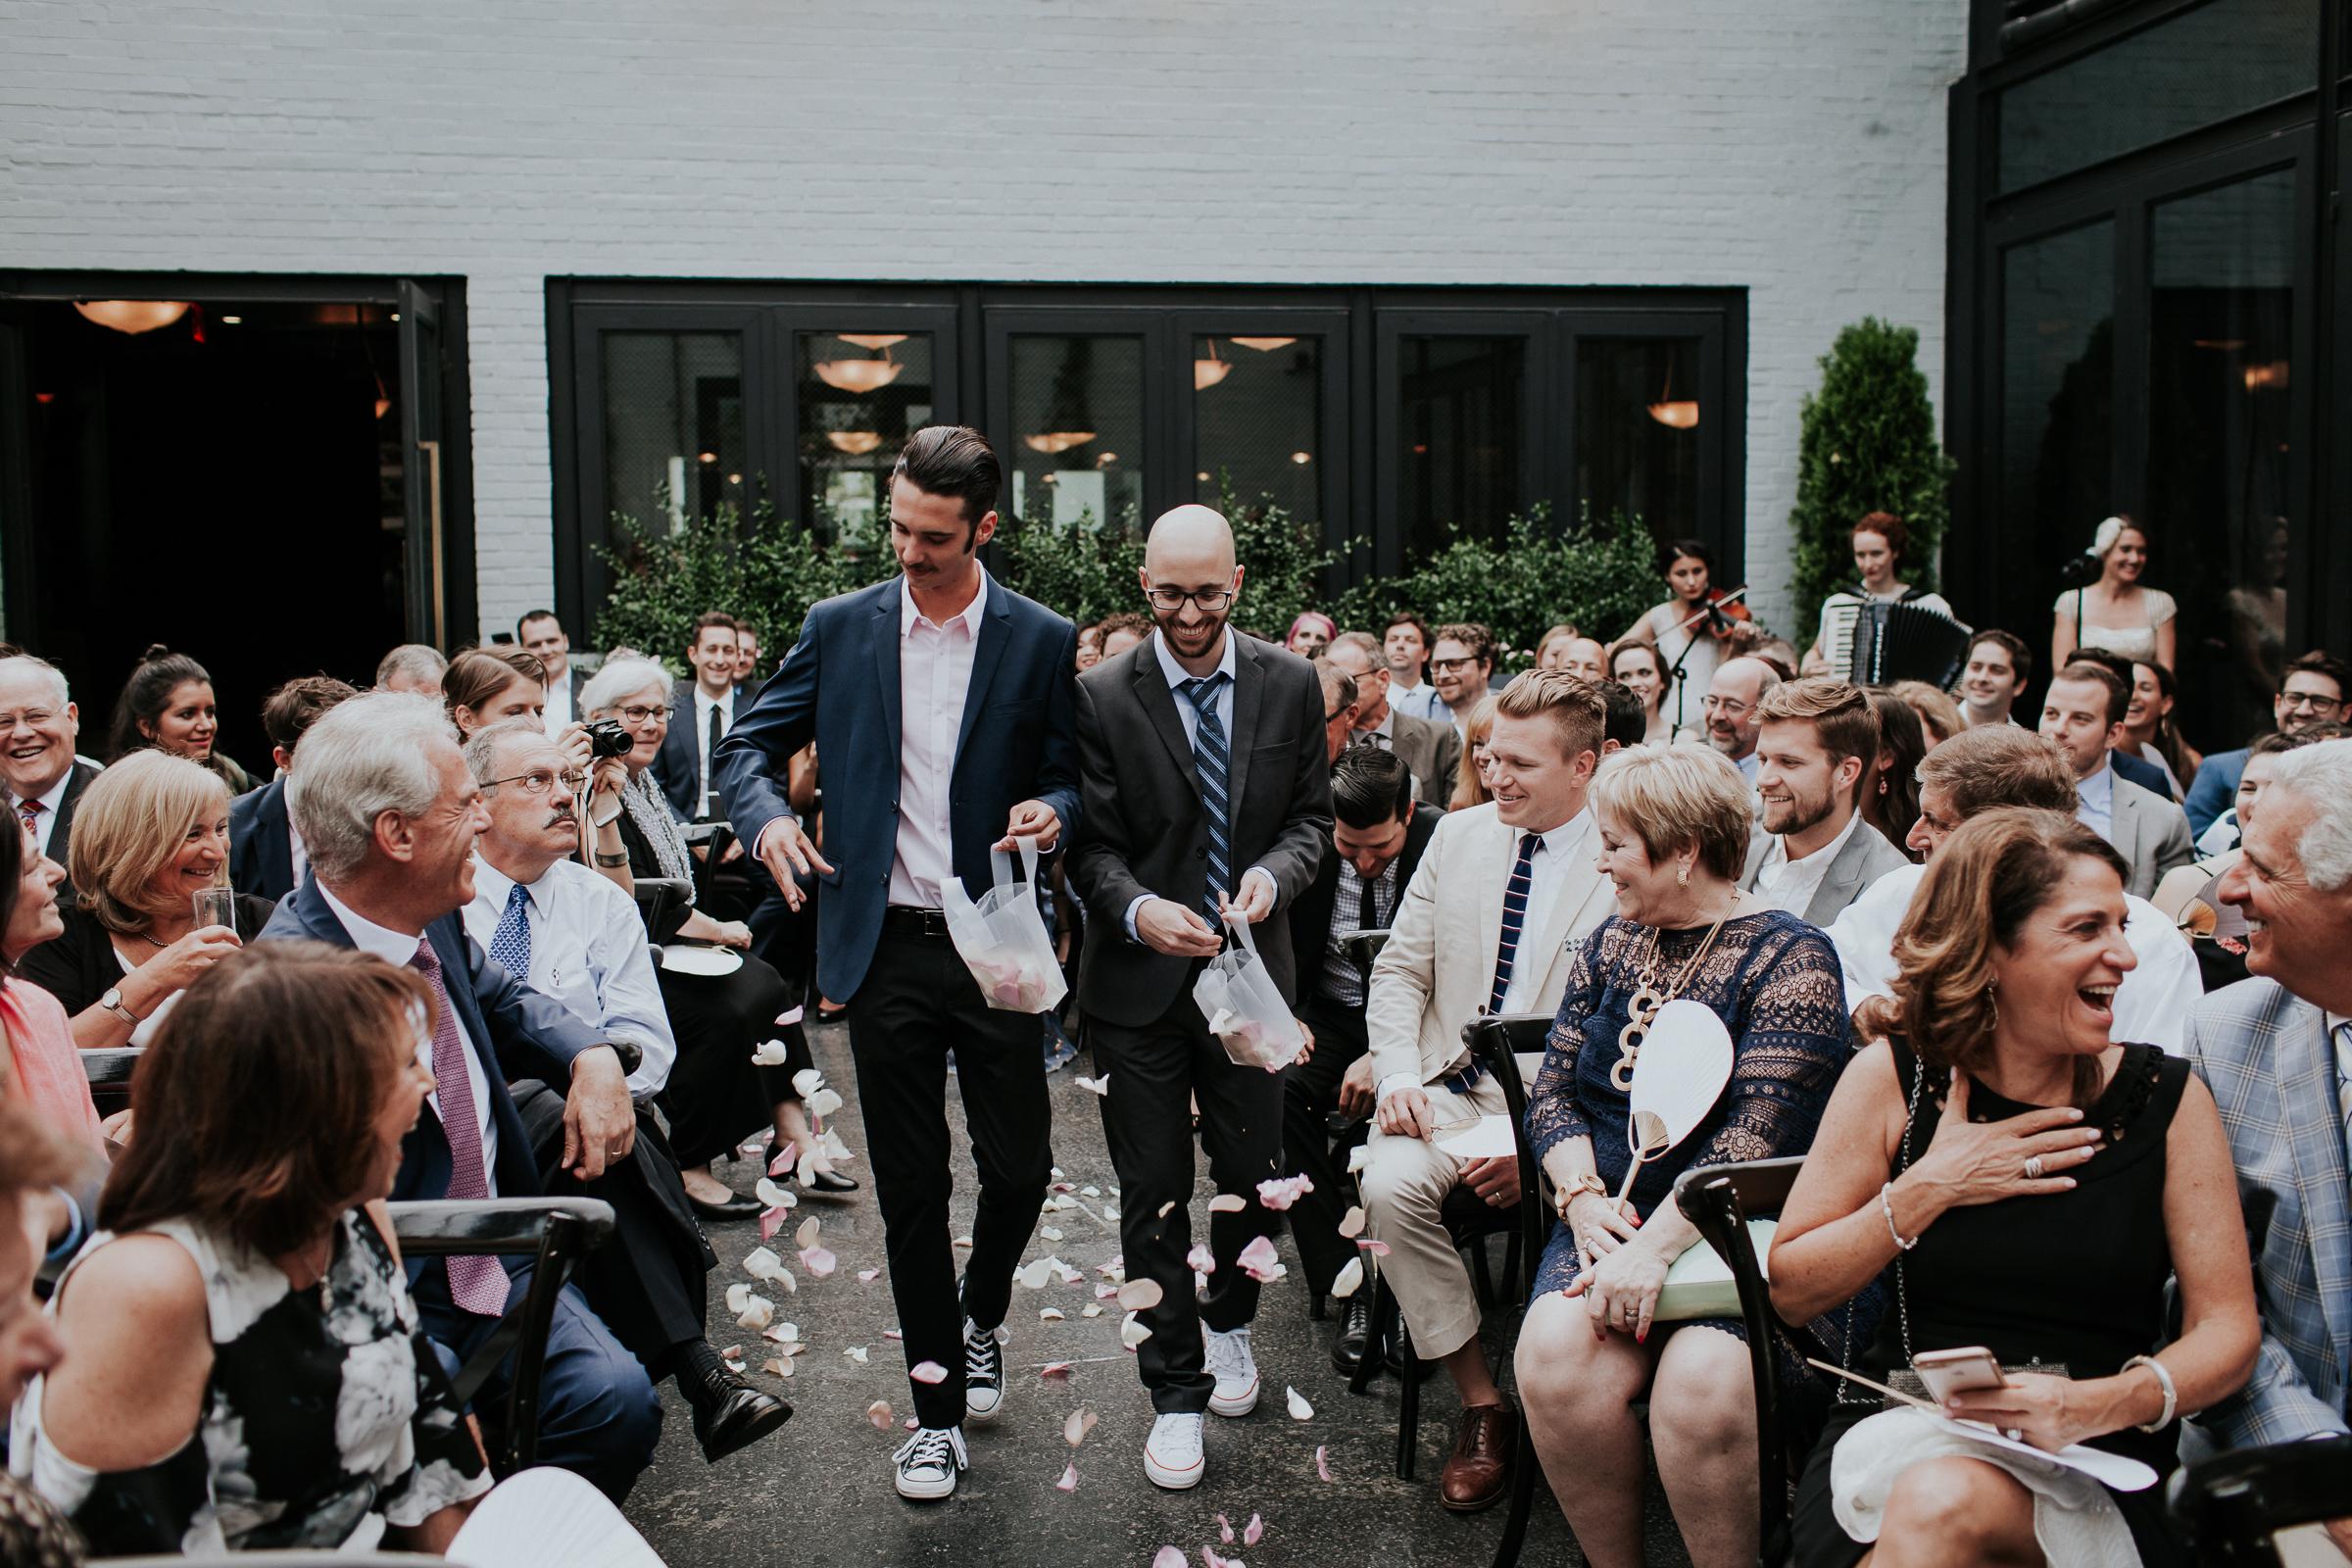 501-Union-Brooklyn-Fine-Art-Documentary-Wedding-Photographer-80.jpg